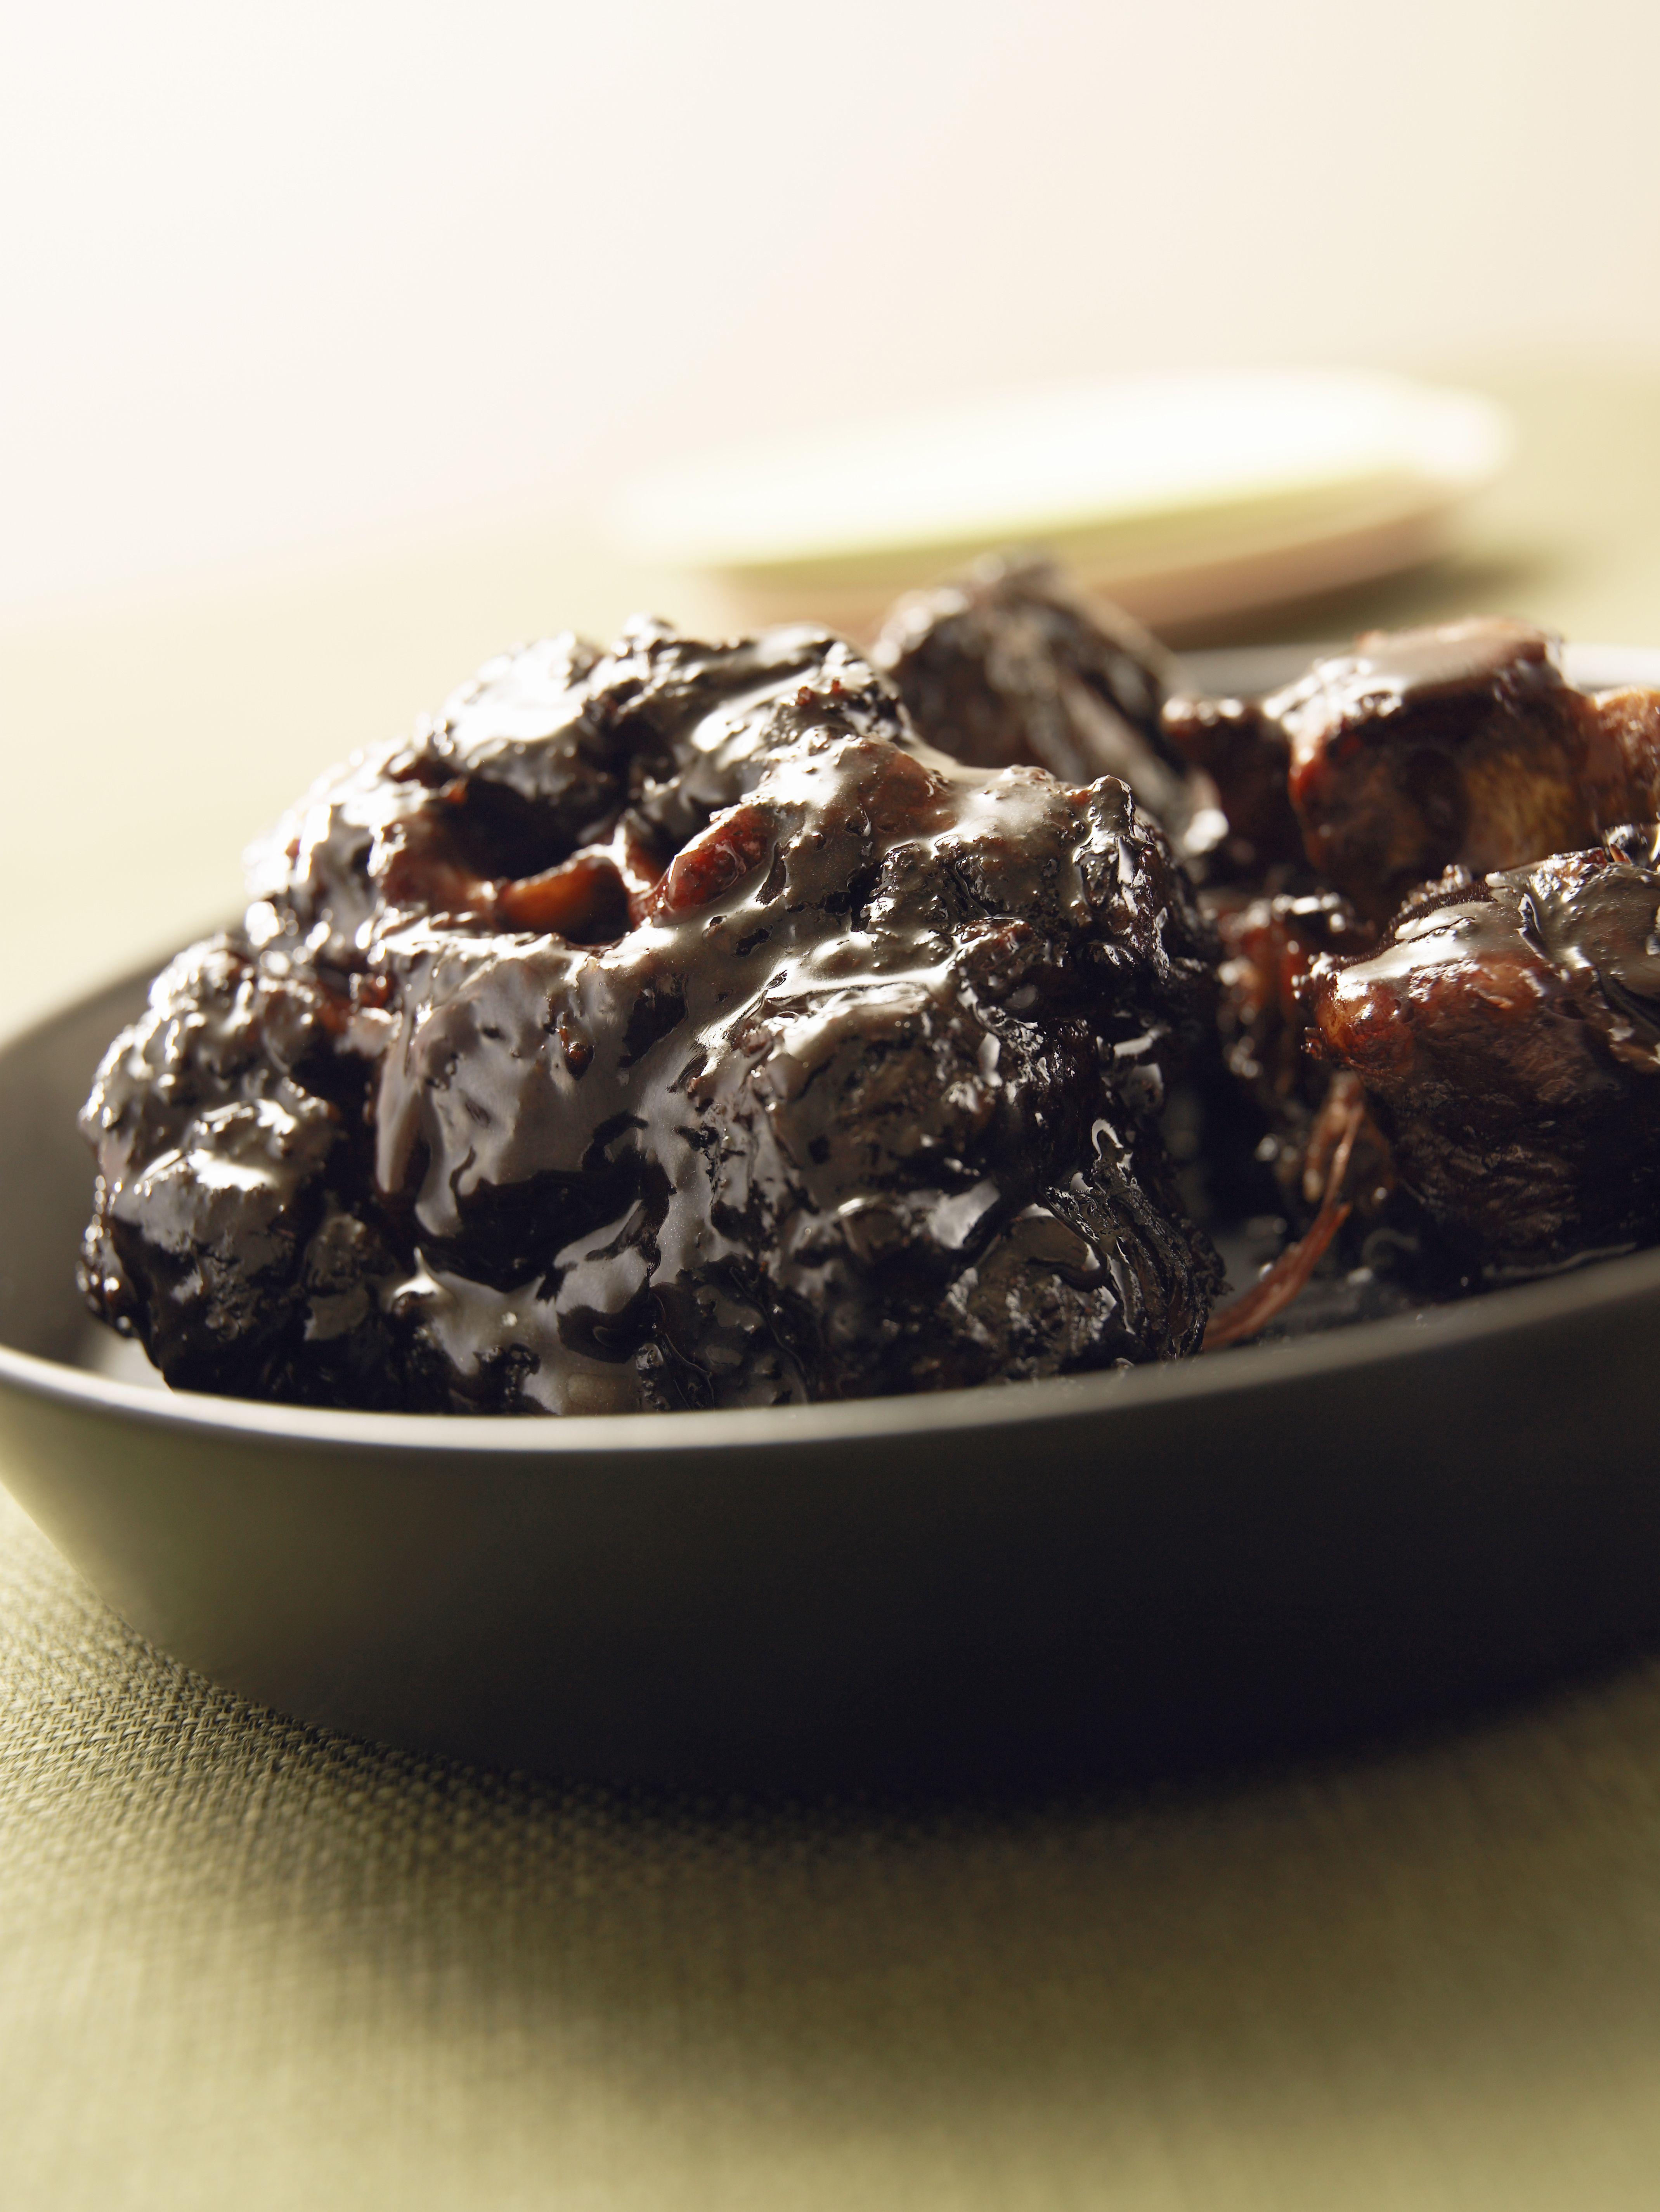 Easy Crock Pot London Broil Steak With Mushrooms Recipe